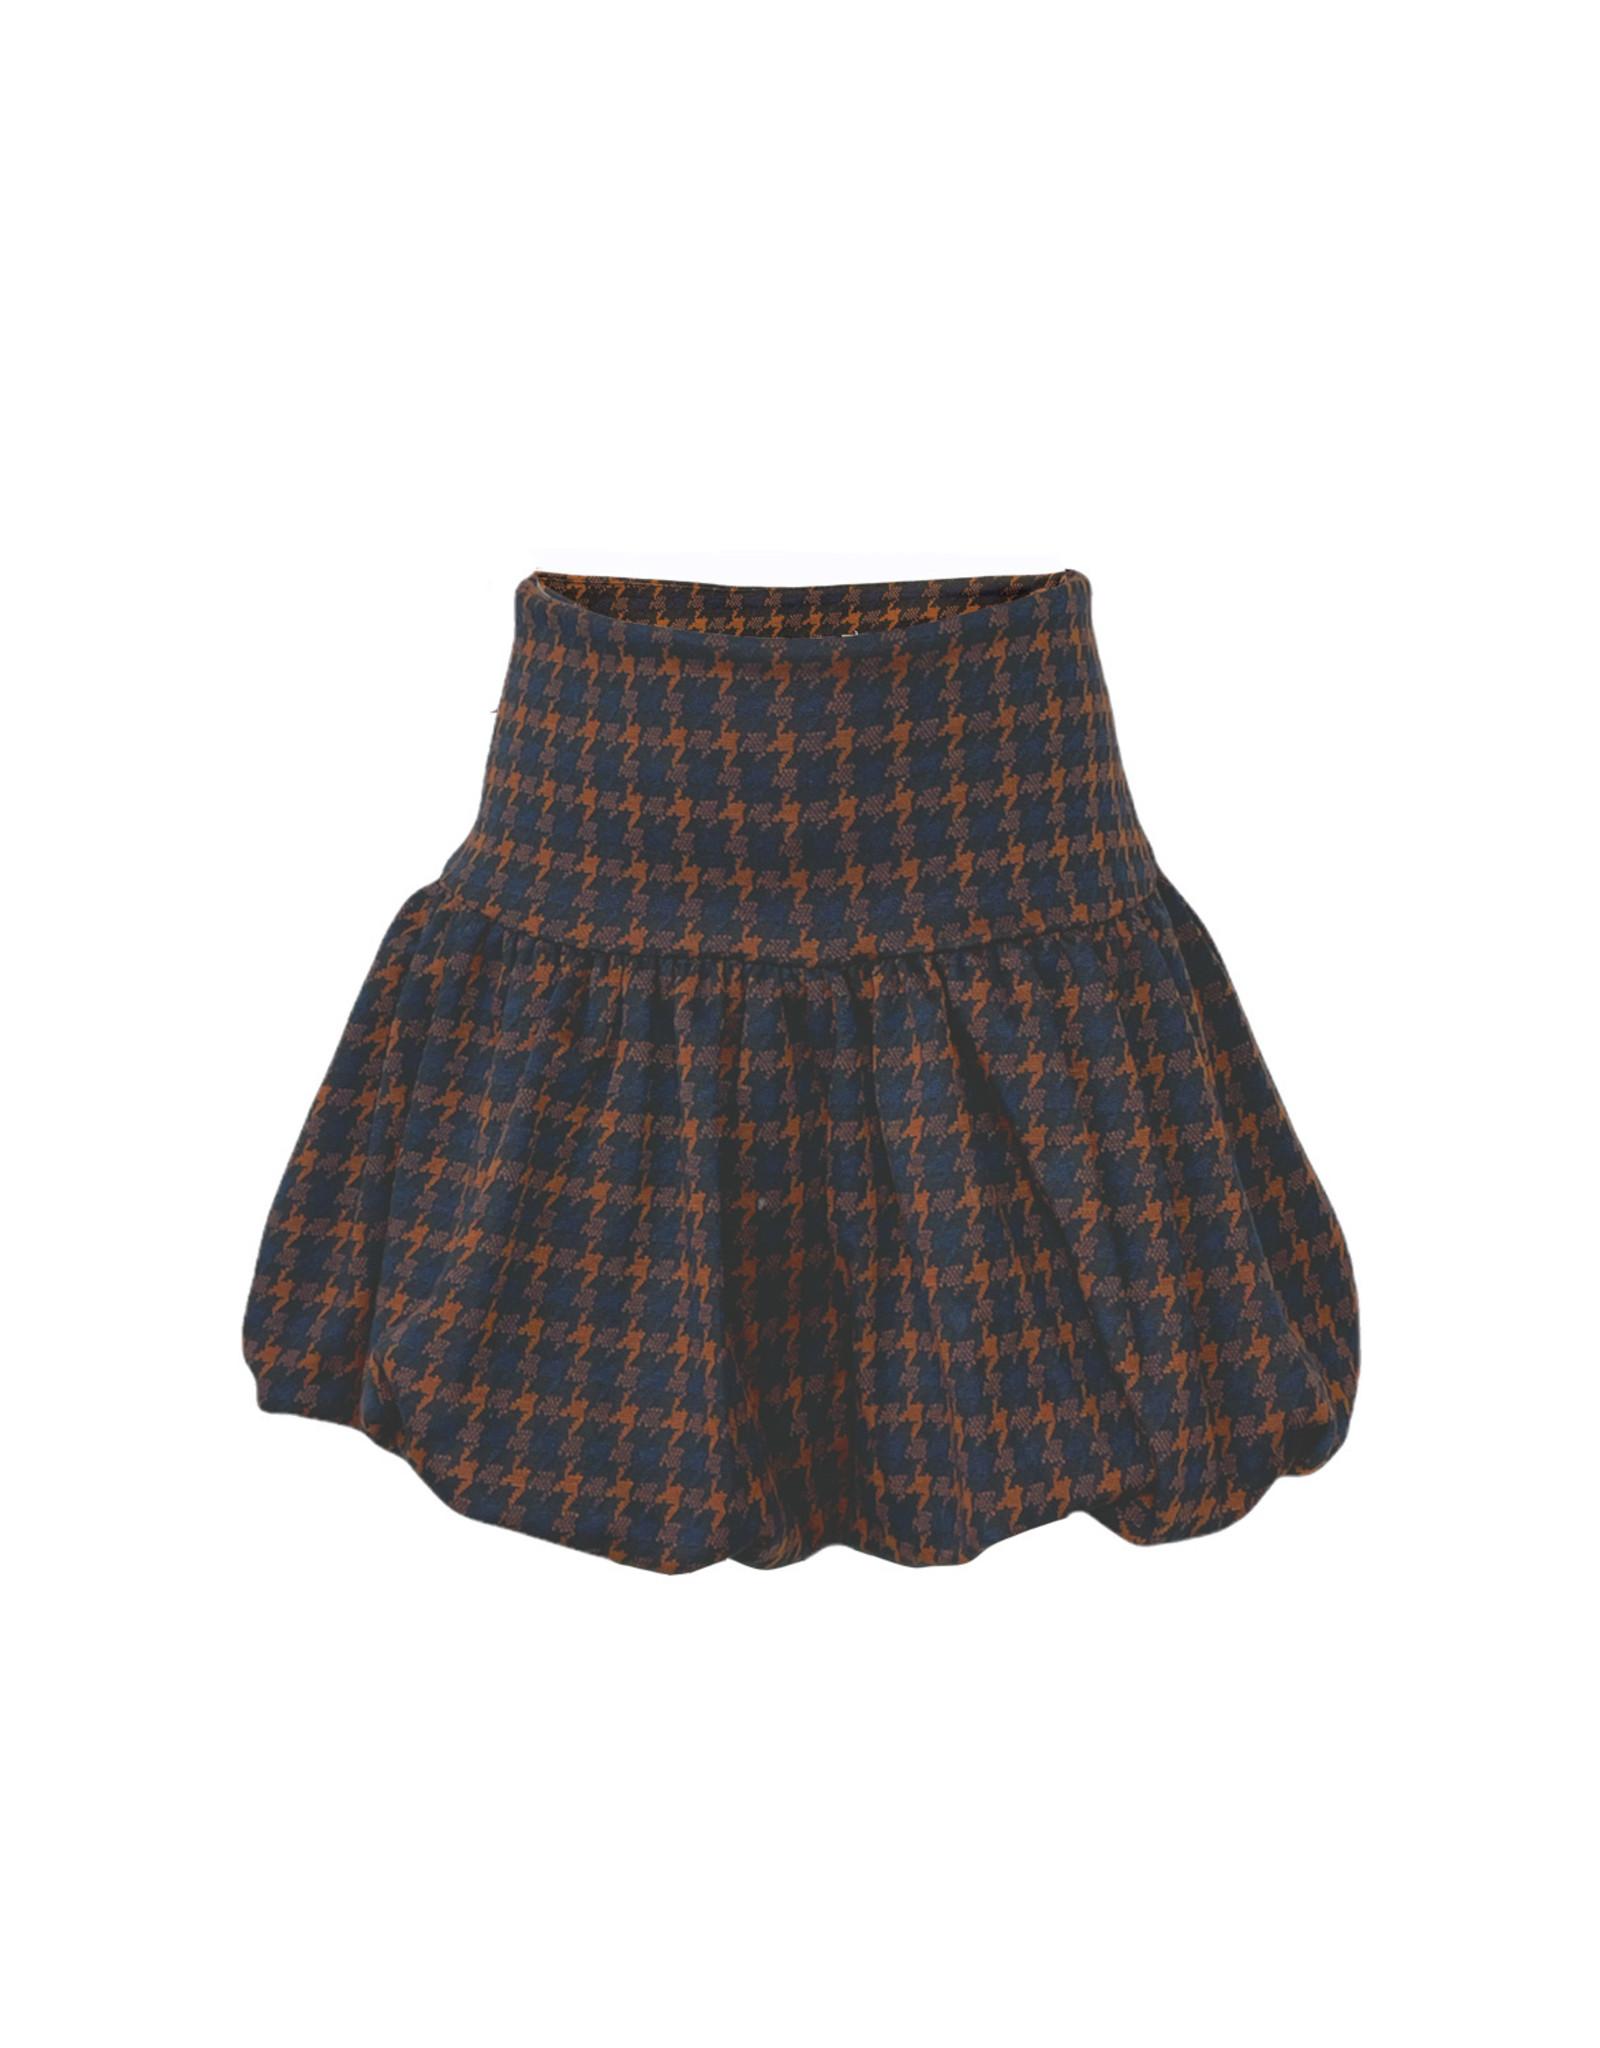 Topitm Topitm Maxime skirt rusty red/black